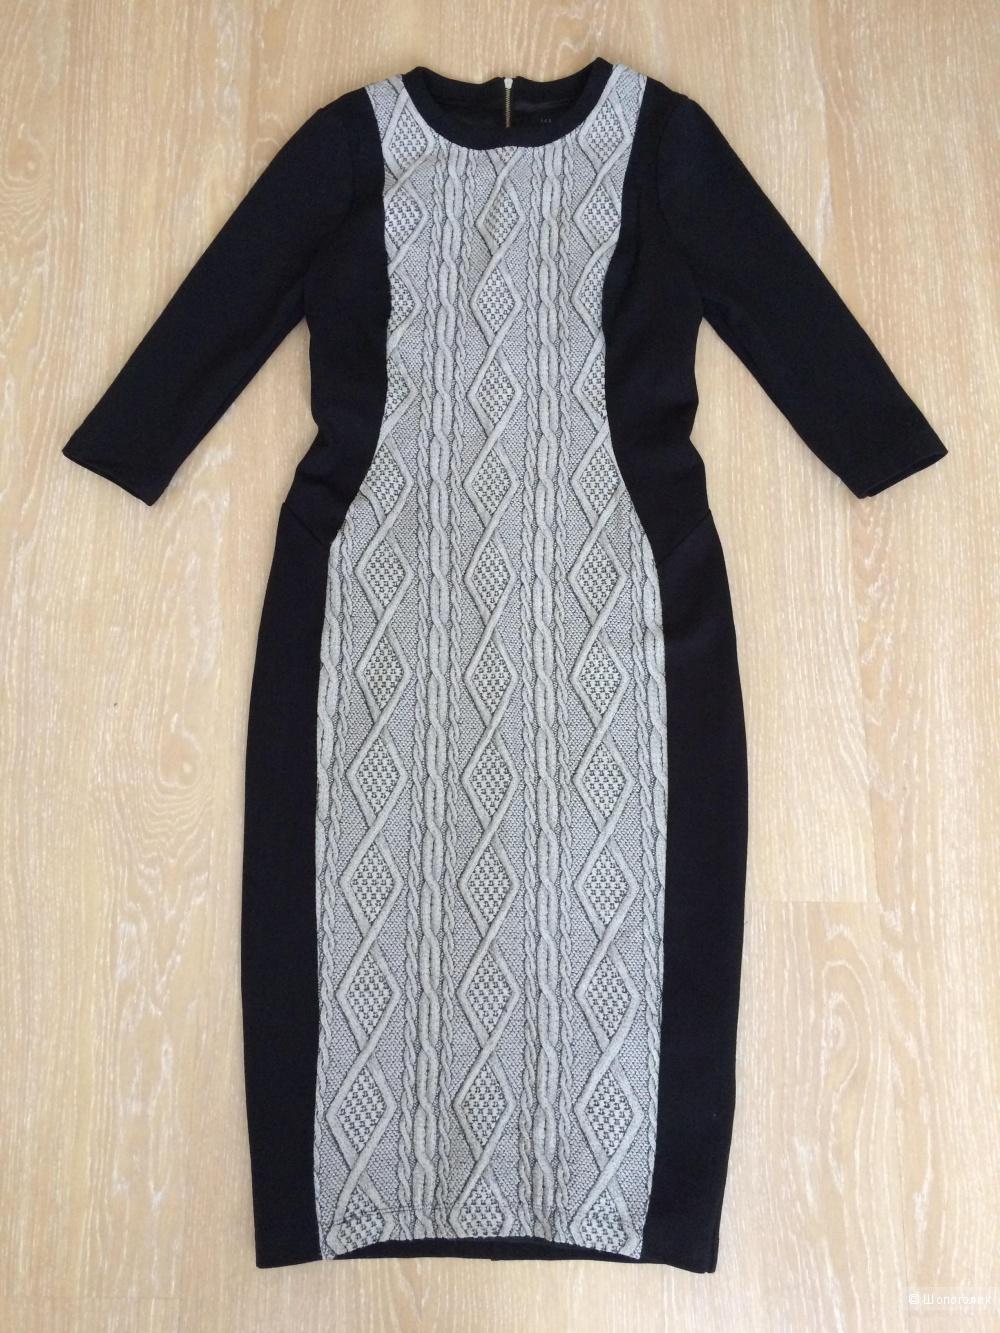 Платье Ted Baker, р-р 2 (42-44)